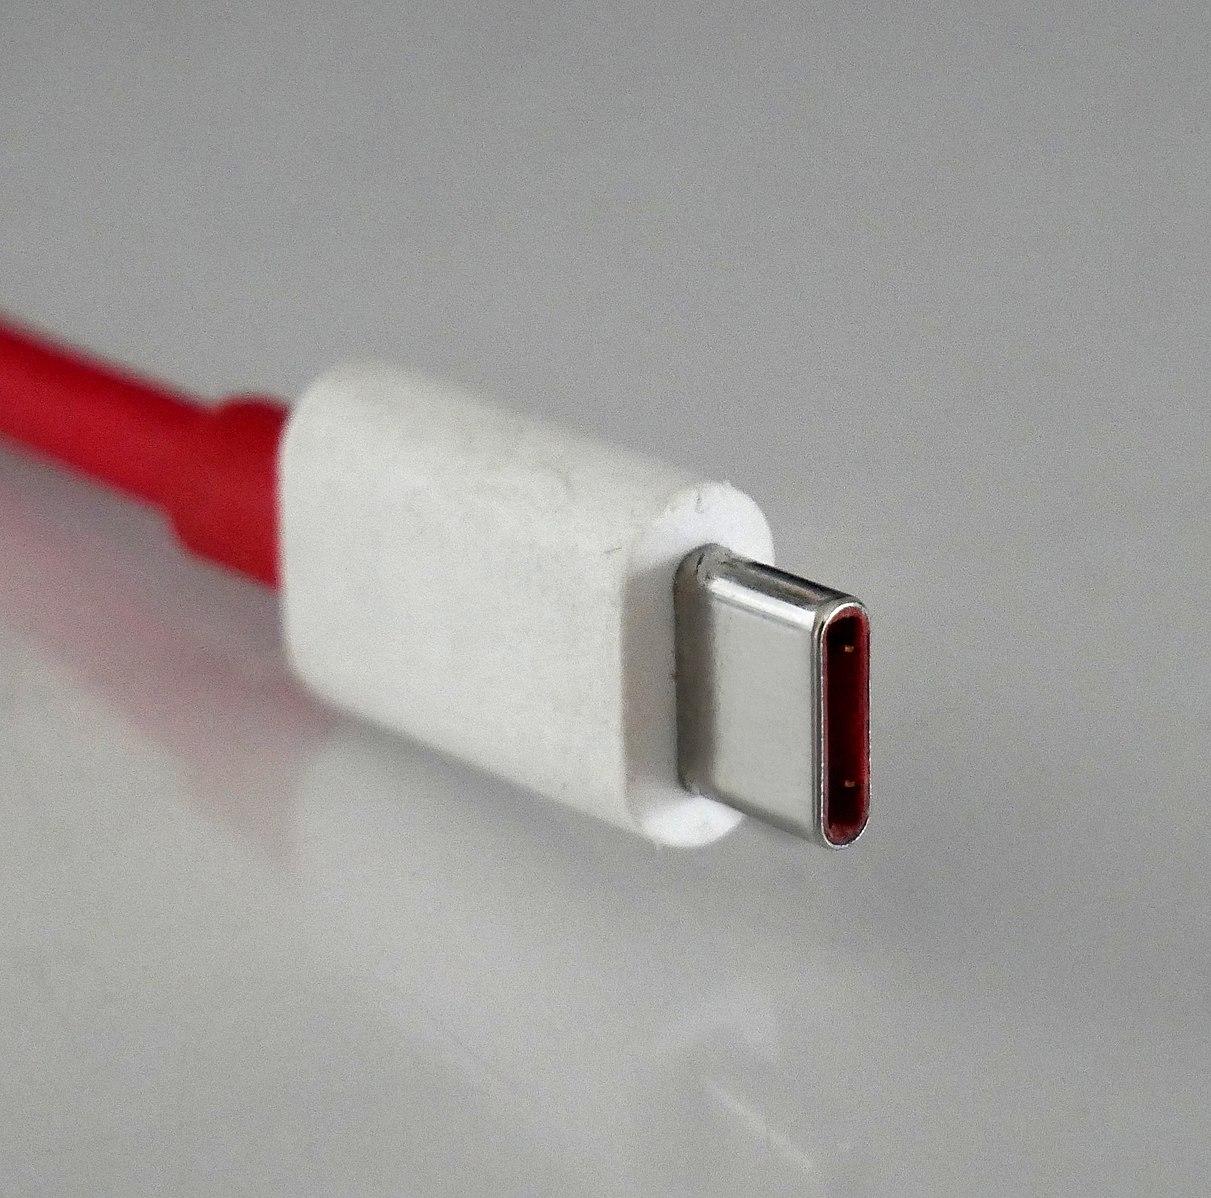 USB Type-C plug 20170626